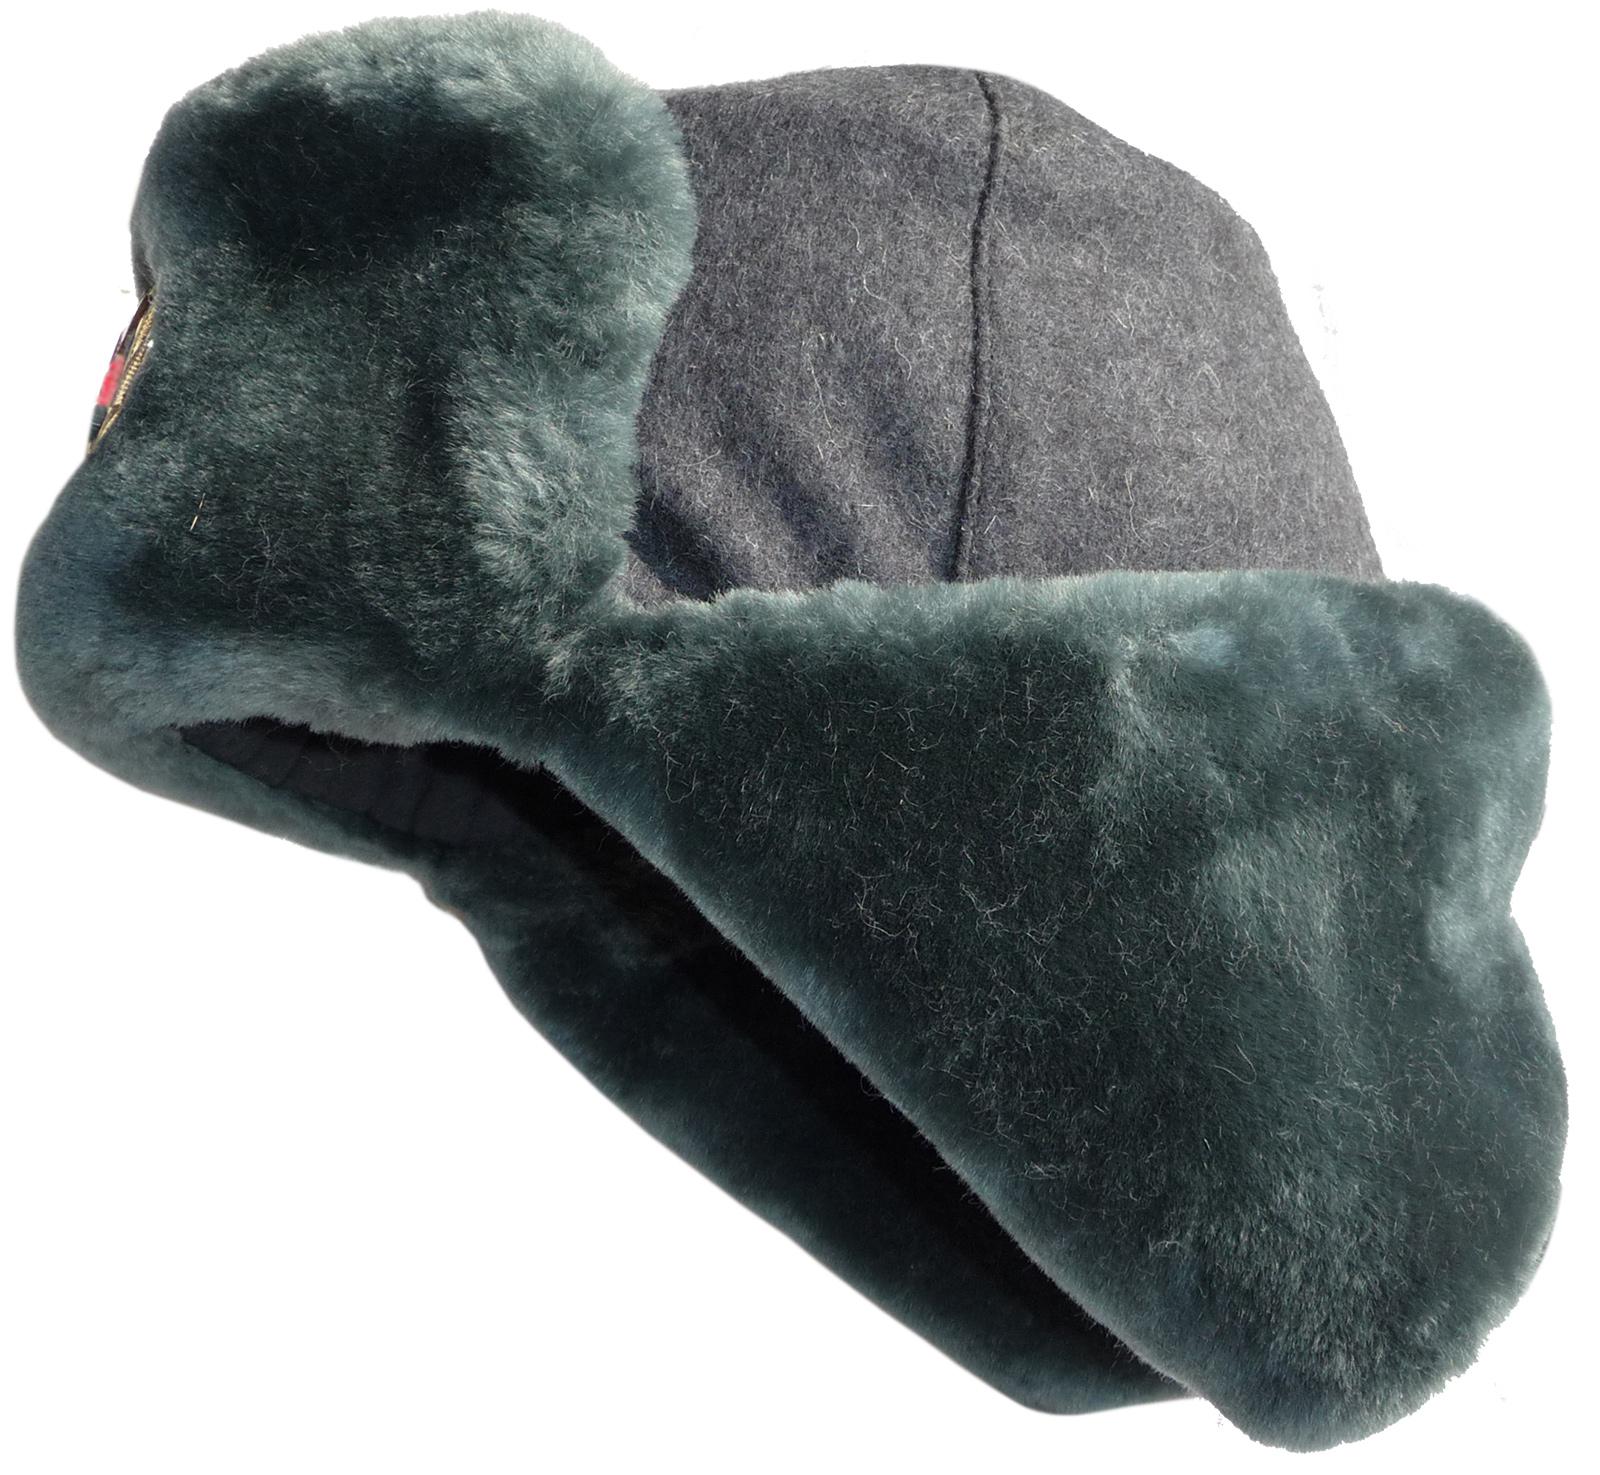 cdbf2284f Sheepskin-like faux fur ushanka hat. Wool top.